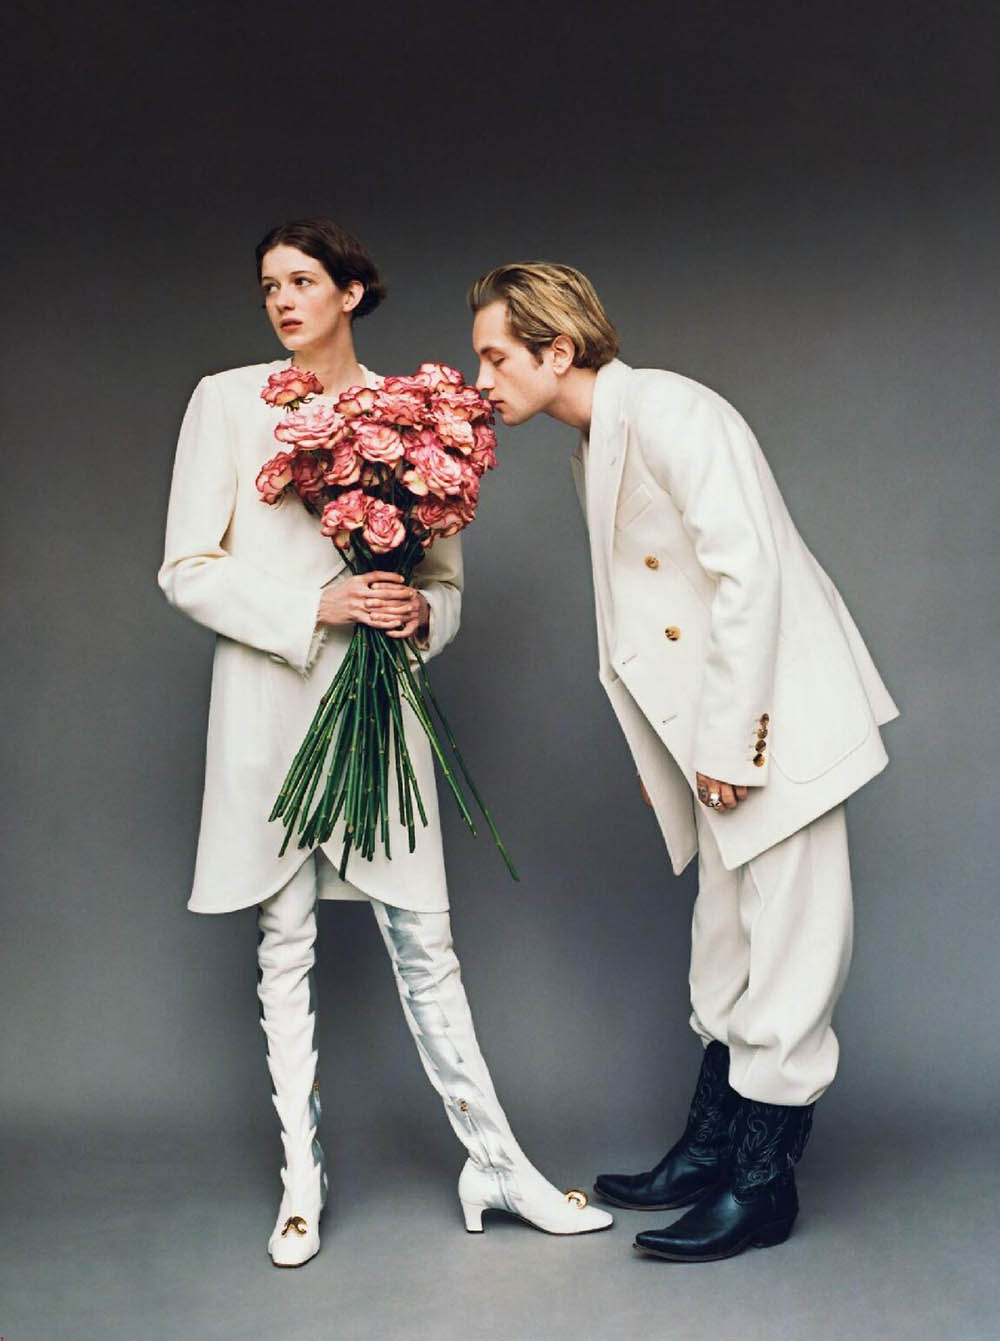 ''C'est Le Bouquet'' by Jonathan Frantini for GQ France June 2019